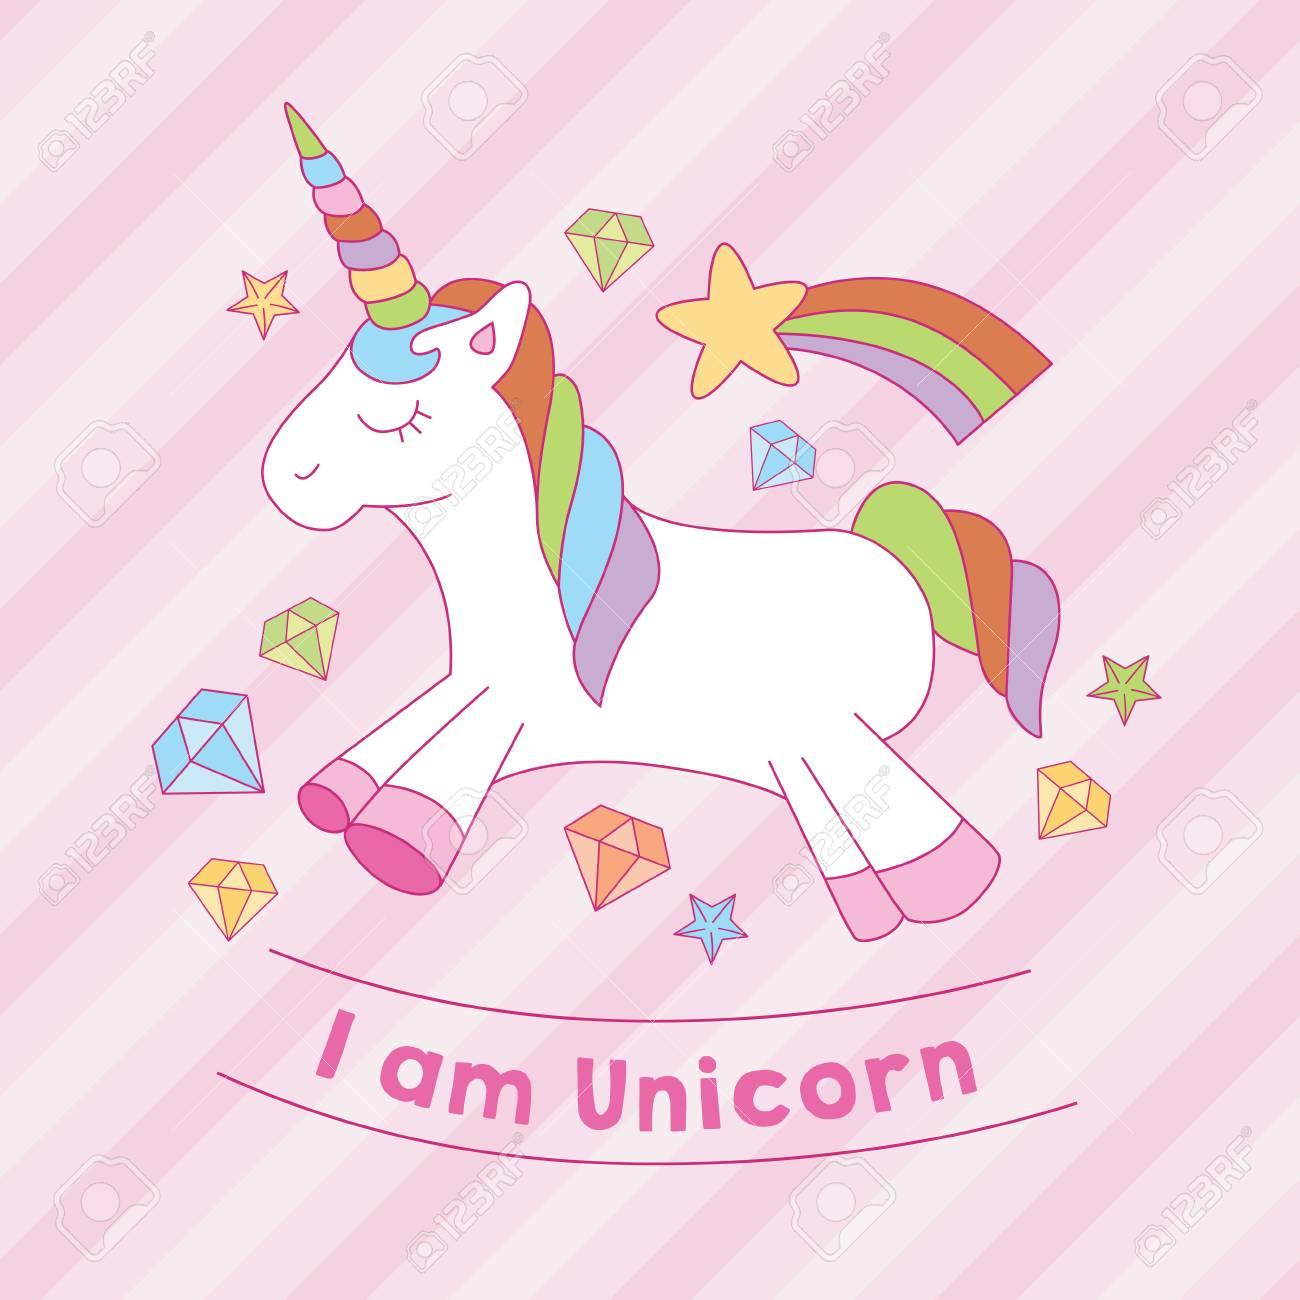 I Am Unicorn Print With Diamond Star Stripe Background Royalty